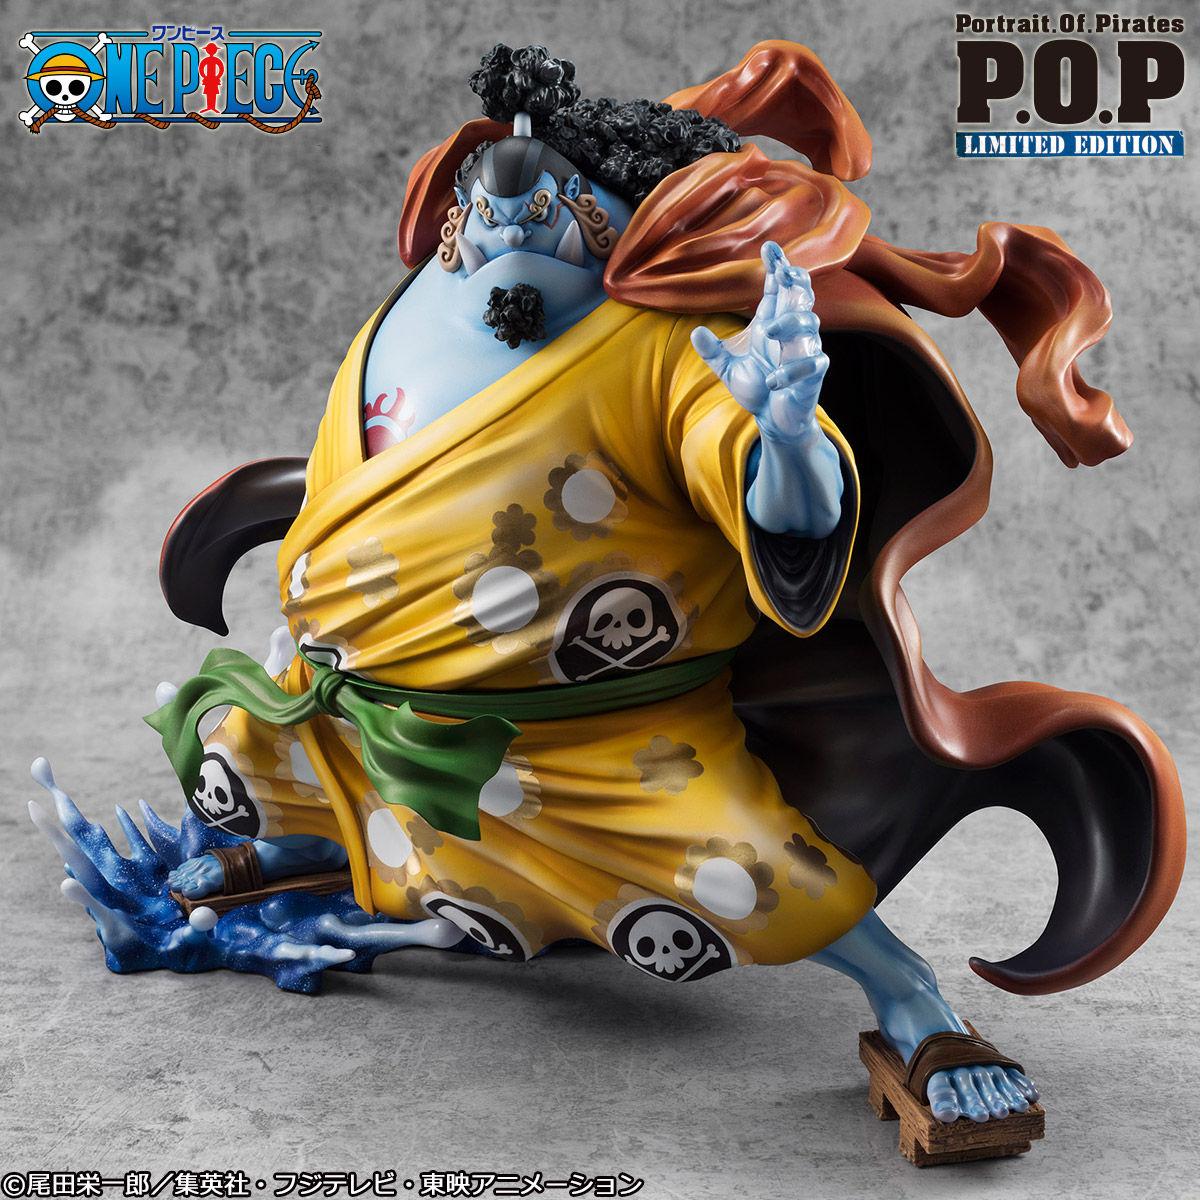 Link a Jinbei POP One Piece pre 01